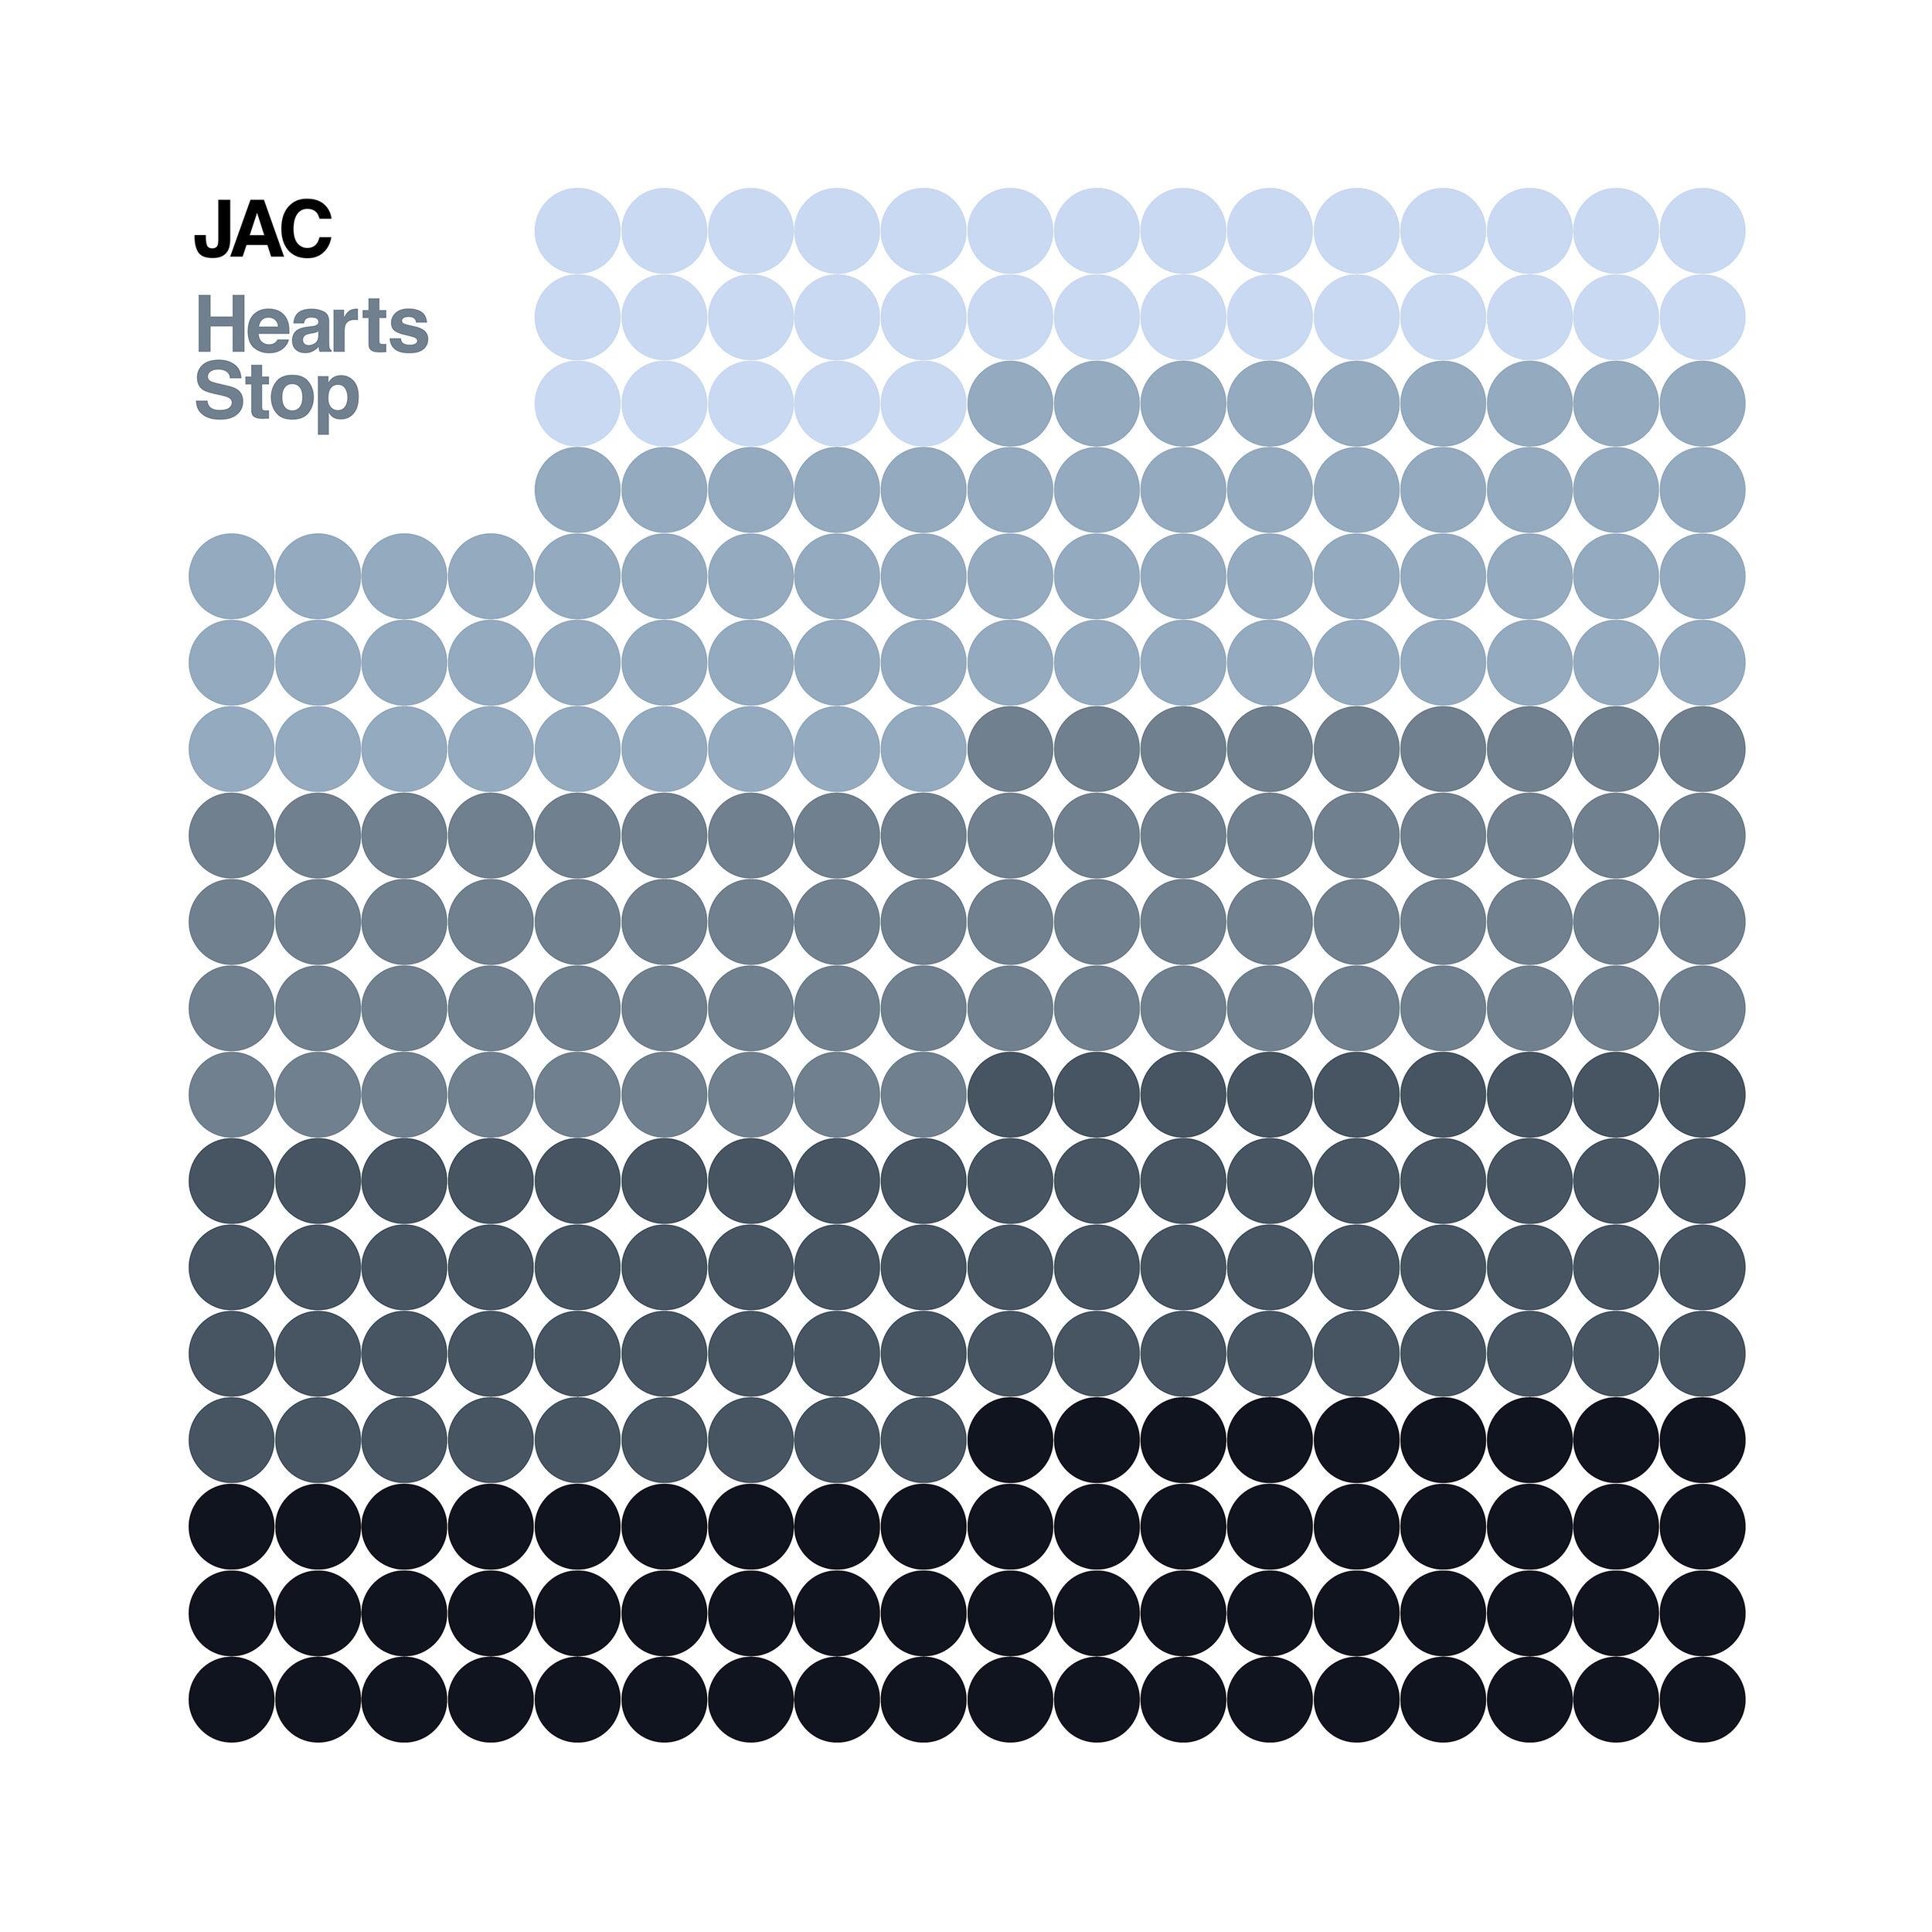 JAC_HS_SINGLE-ART_TYPE-EDIT_11012018_1.jpg